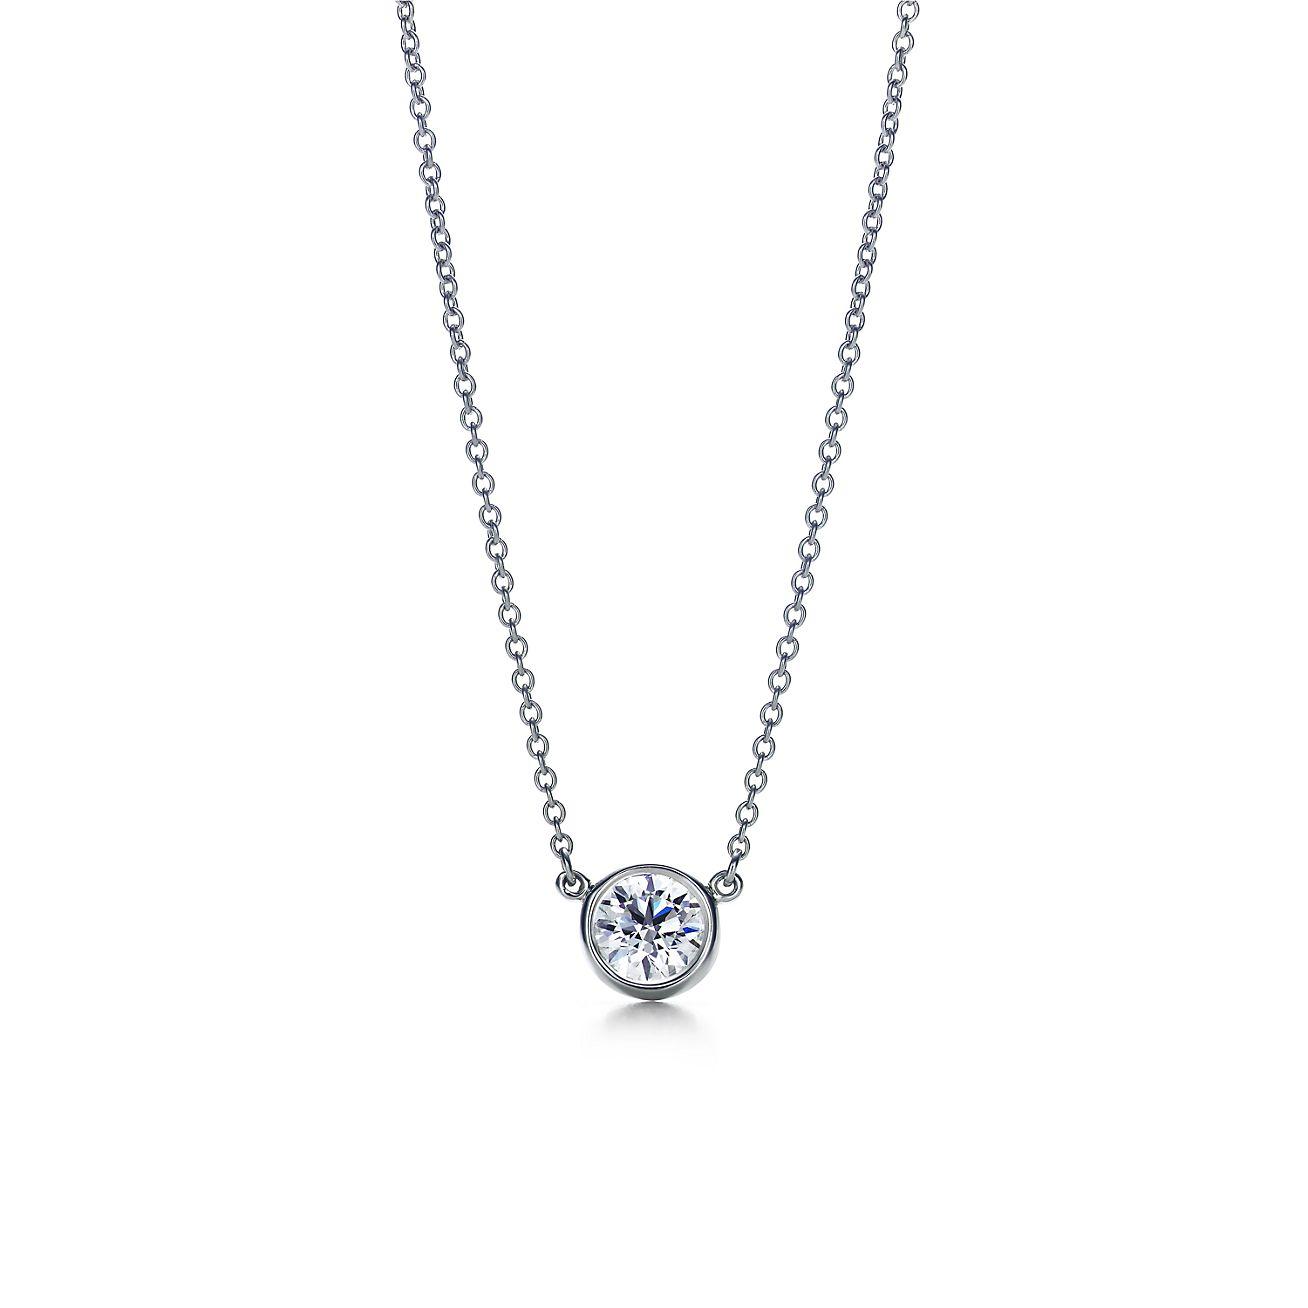 Elsa Peretti Diamonds by the Yard pendant in platinum Tiffany & Co.